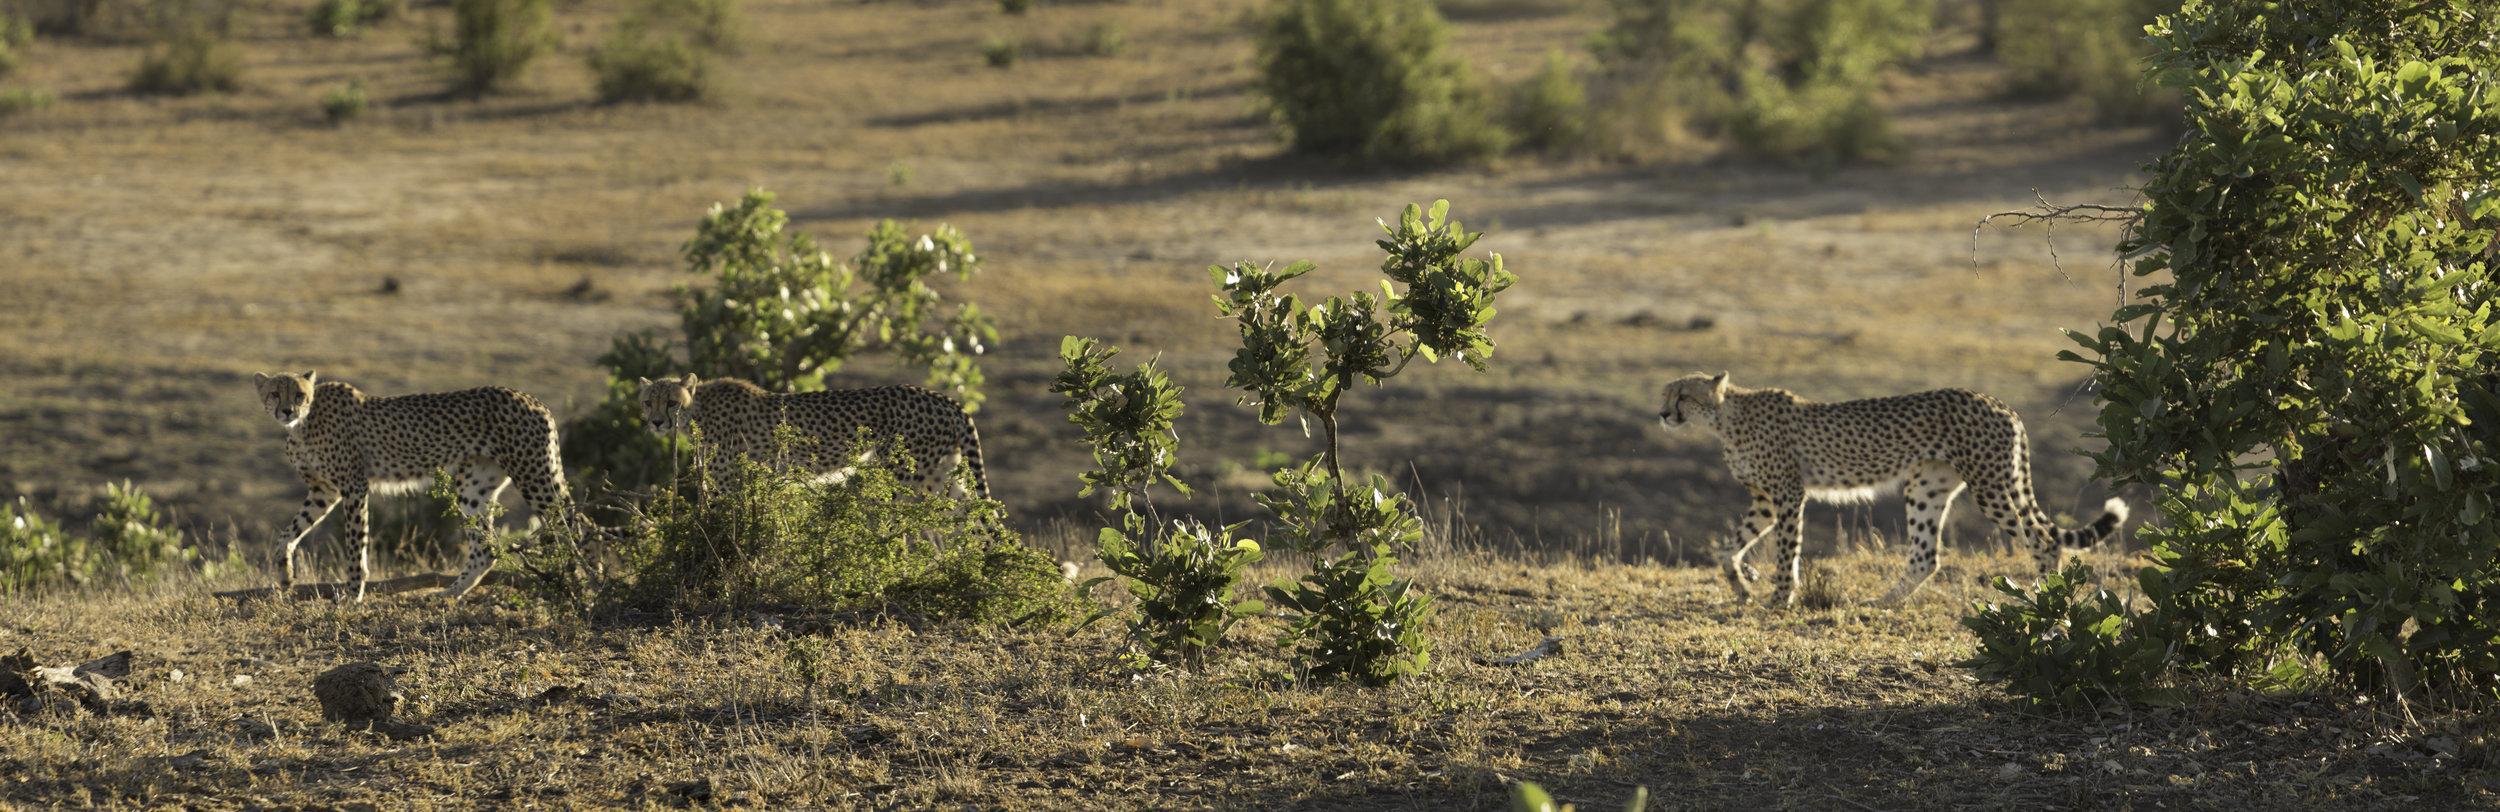 100% of profits go to helping cheetahs thrive. -